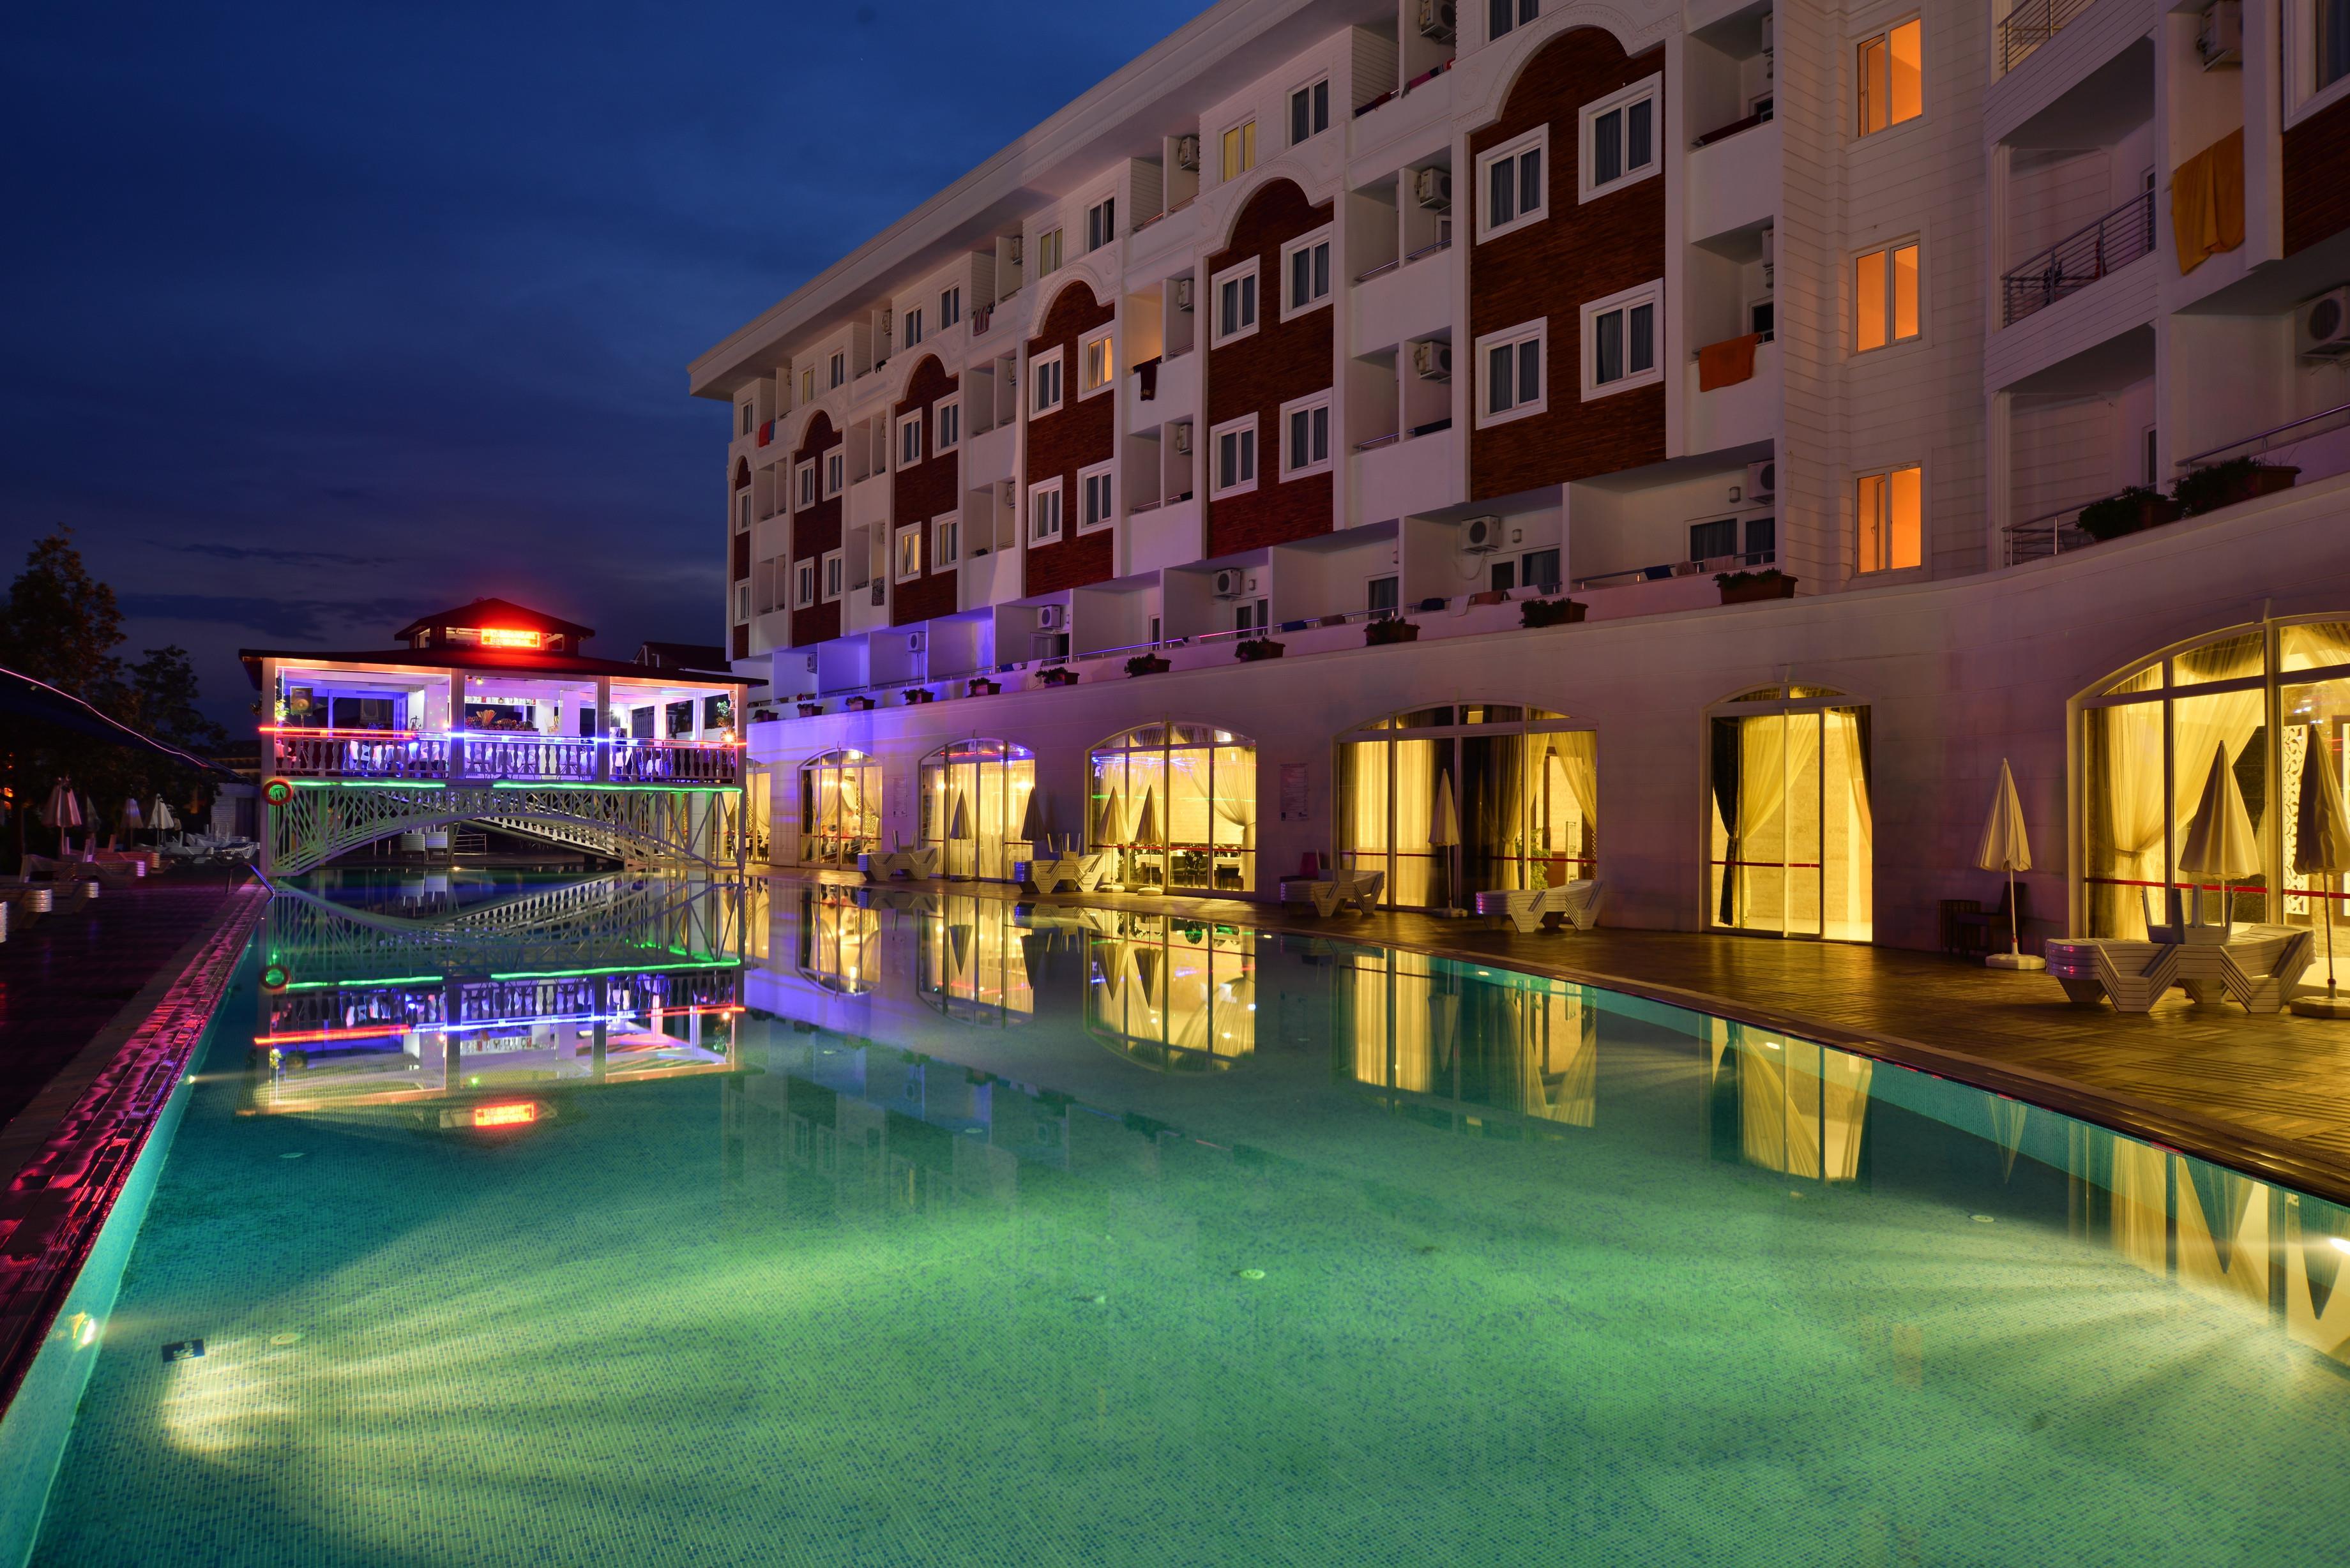 http://www.orextravel.sk/OREX/hotelphotos/side-royal-paradise-general-0020.jpg